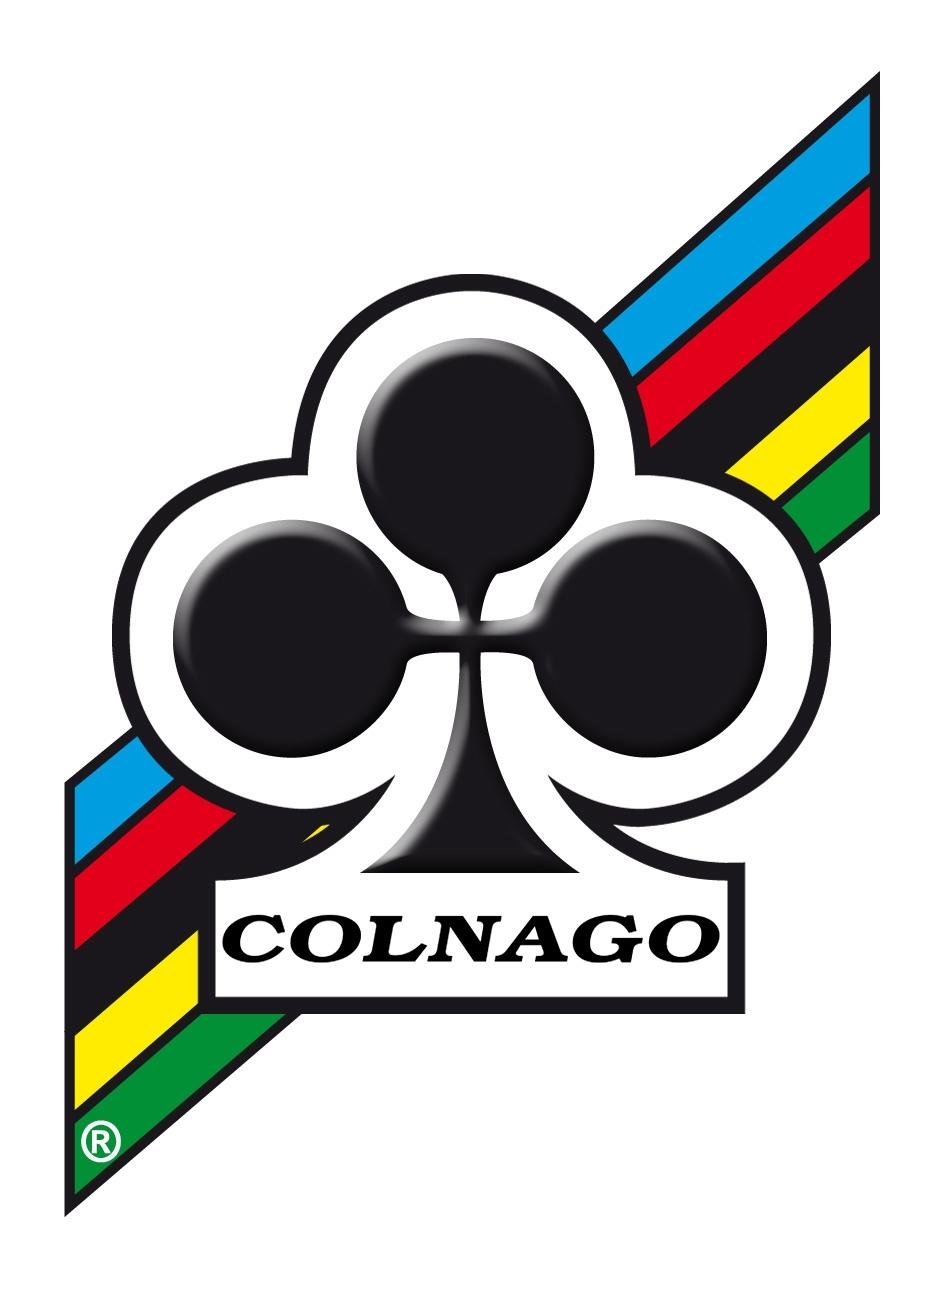 Colnago.JPG